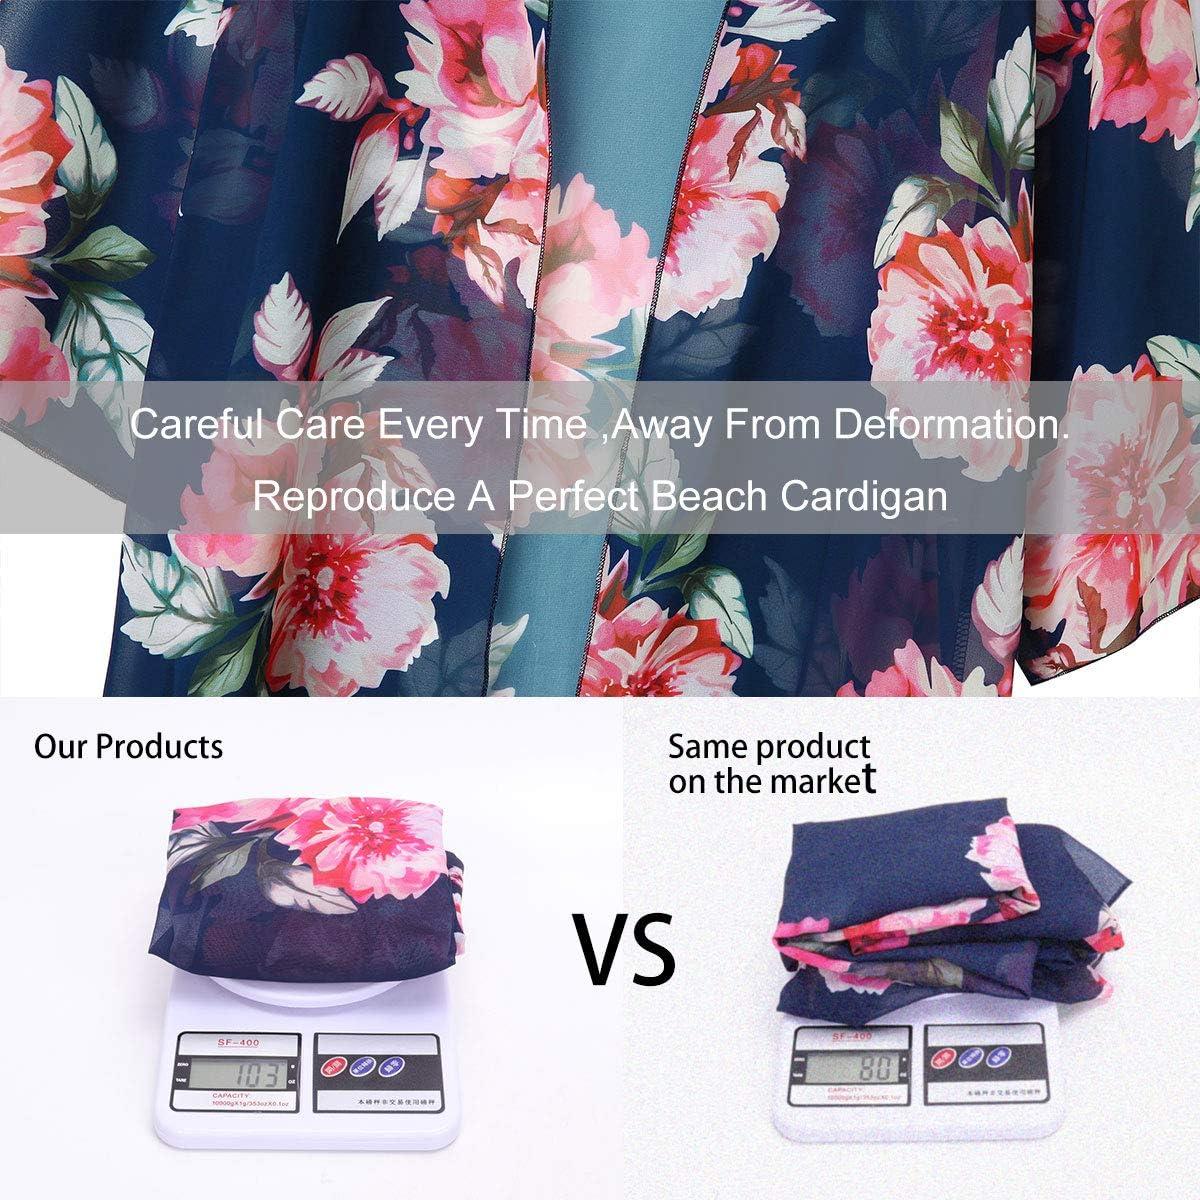 Floral Cover Up Chiffon Print Loose Shawl Beachwear Boho Summer Casual Blouse Swimwear Cardigan Swimsuit for Ladies YONHEE Women Floral Kimono Cardigans